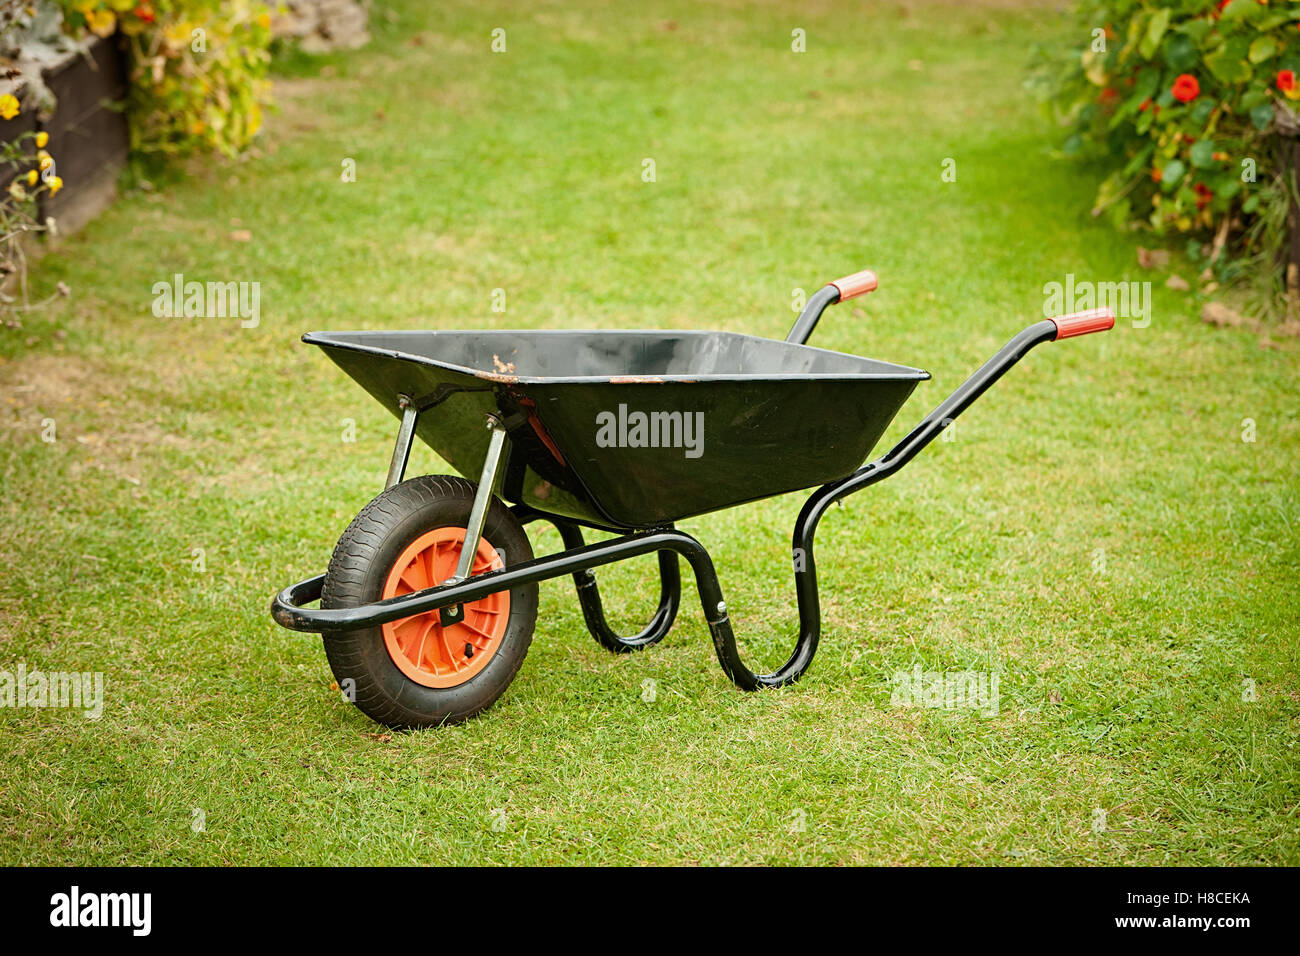 gardeners wheelbarrow standing on a lawn - Stock Image